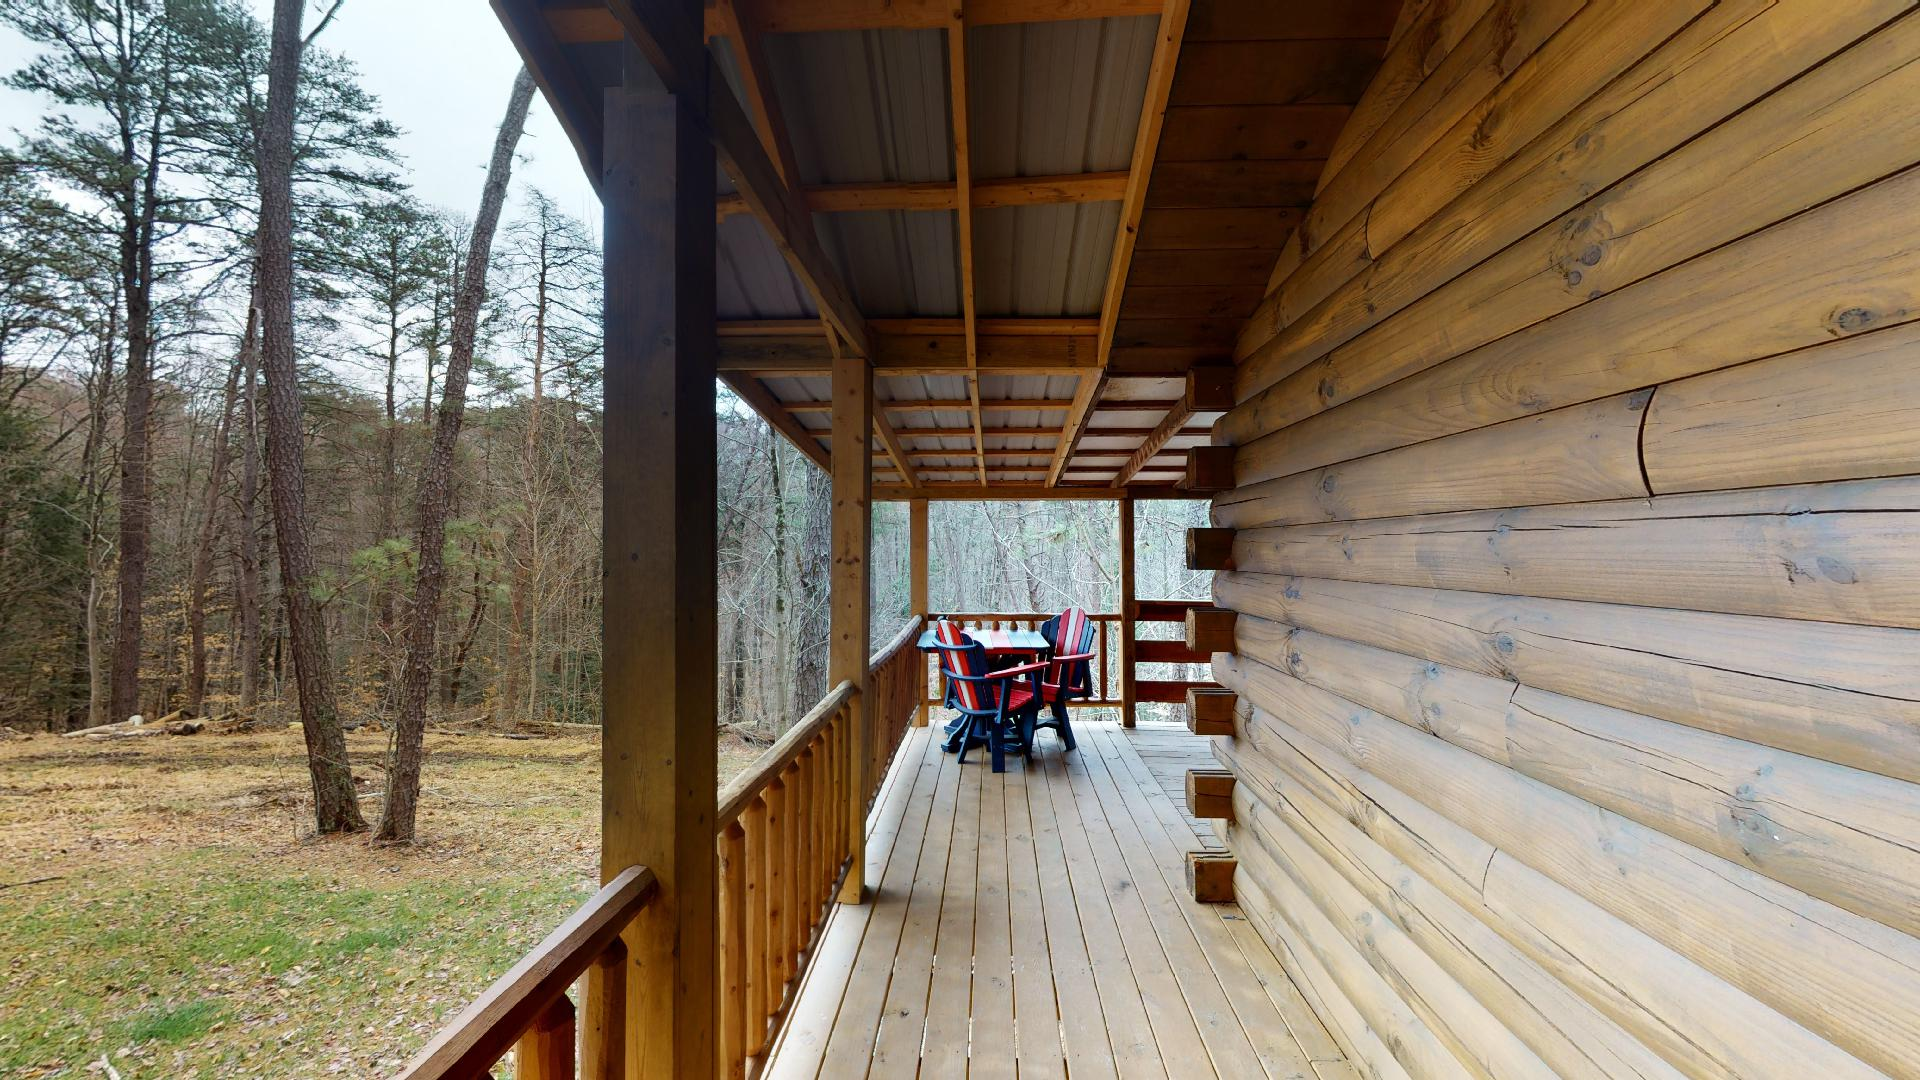 Trail Ridge Porch - Covered porch view.